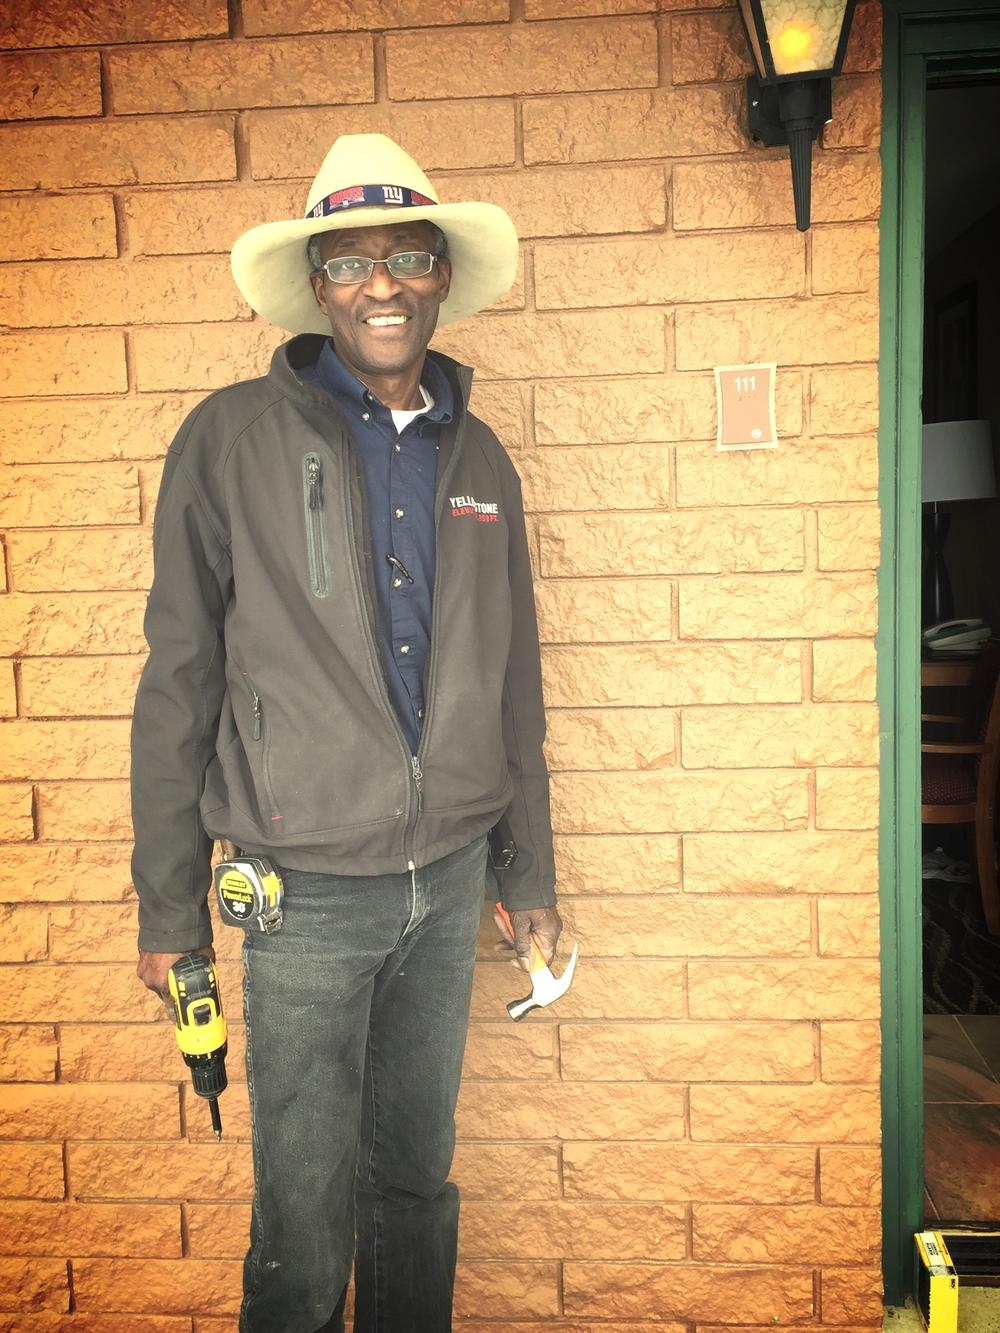 Maurice the maintenance man extrordinaire. Best Western knows Best!